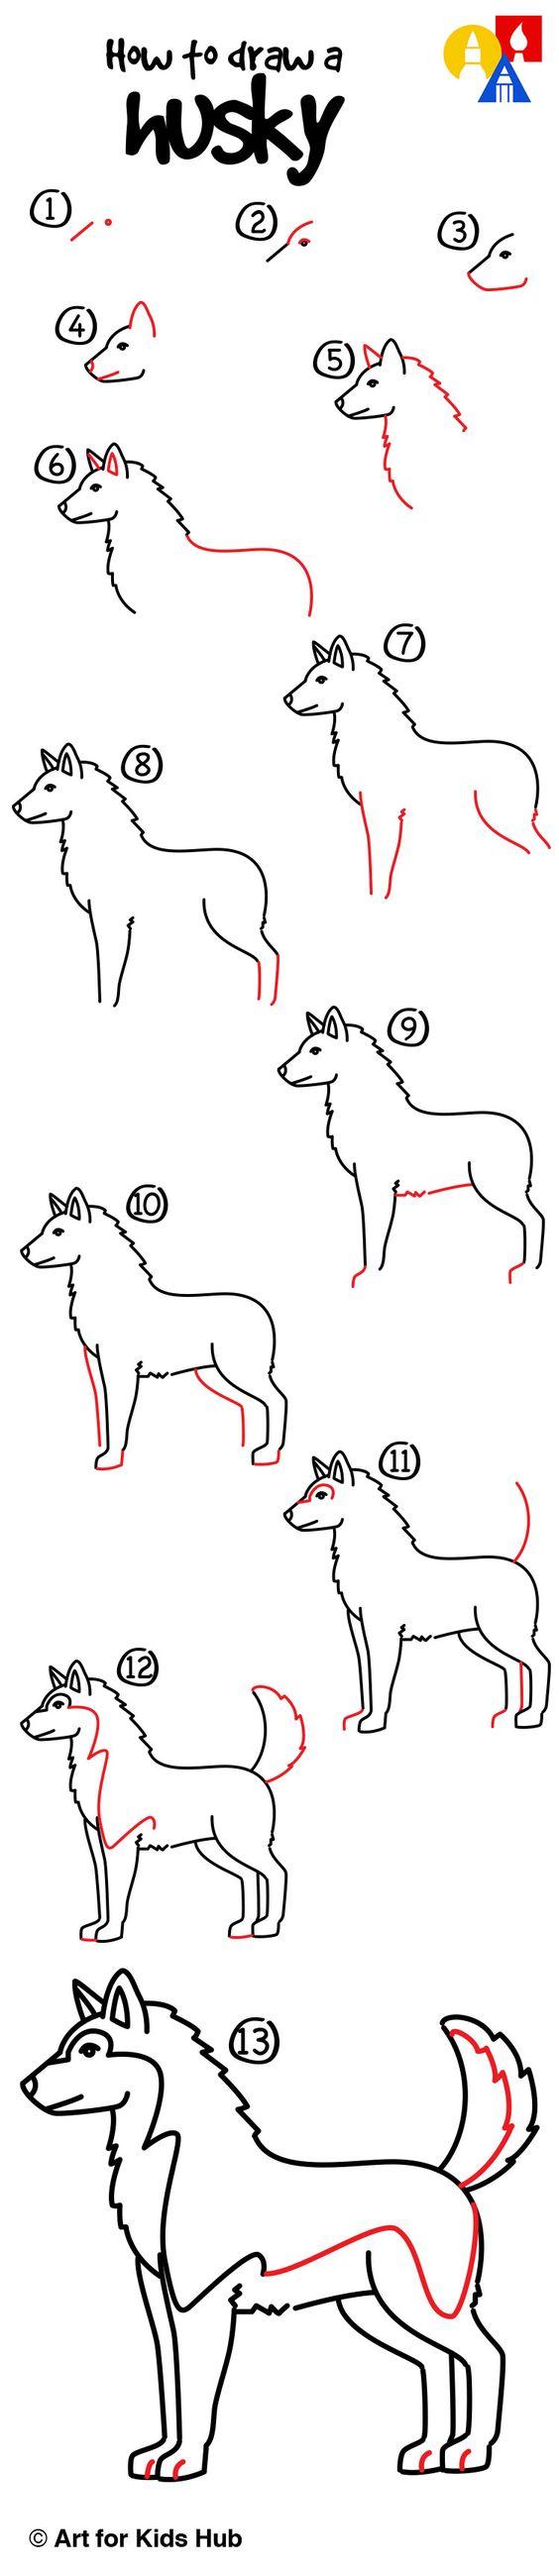 How To Draw A Dog Husky Step By Step